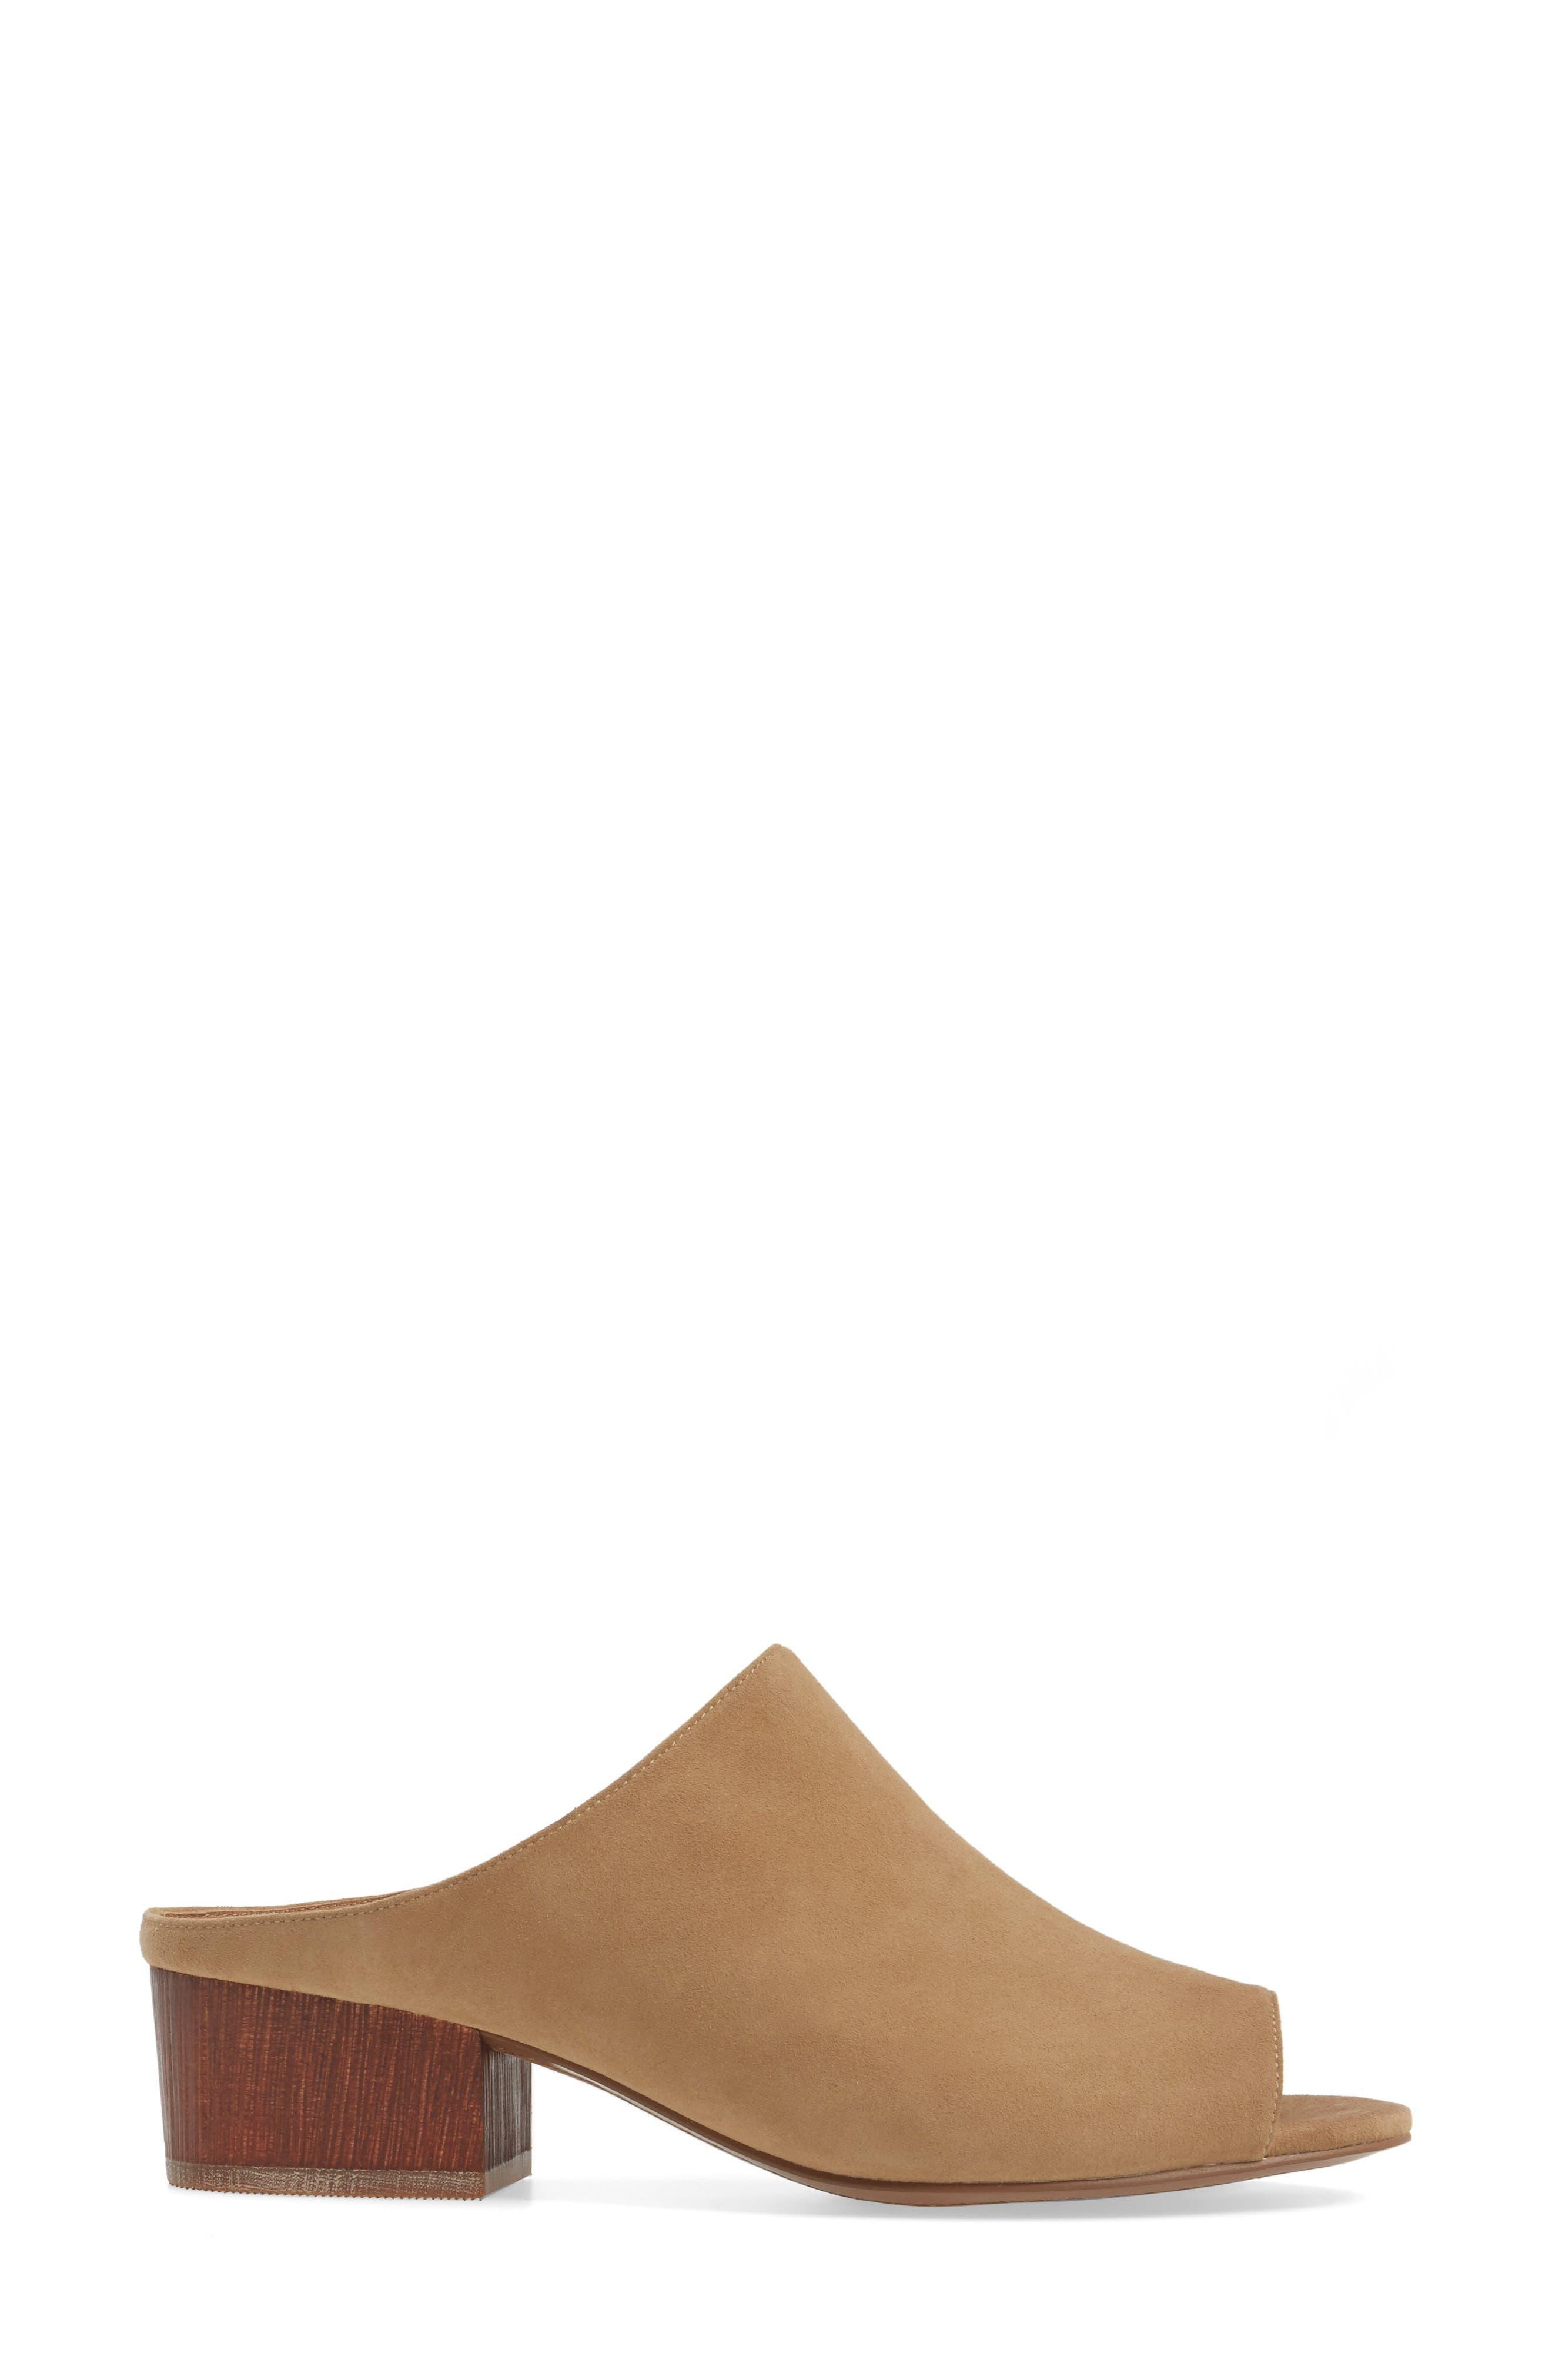 Cinch Block Heel Mule,                             Alternate thumbnail 12, color,